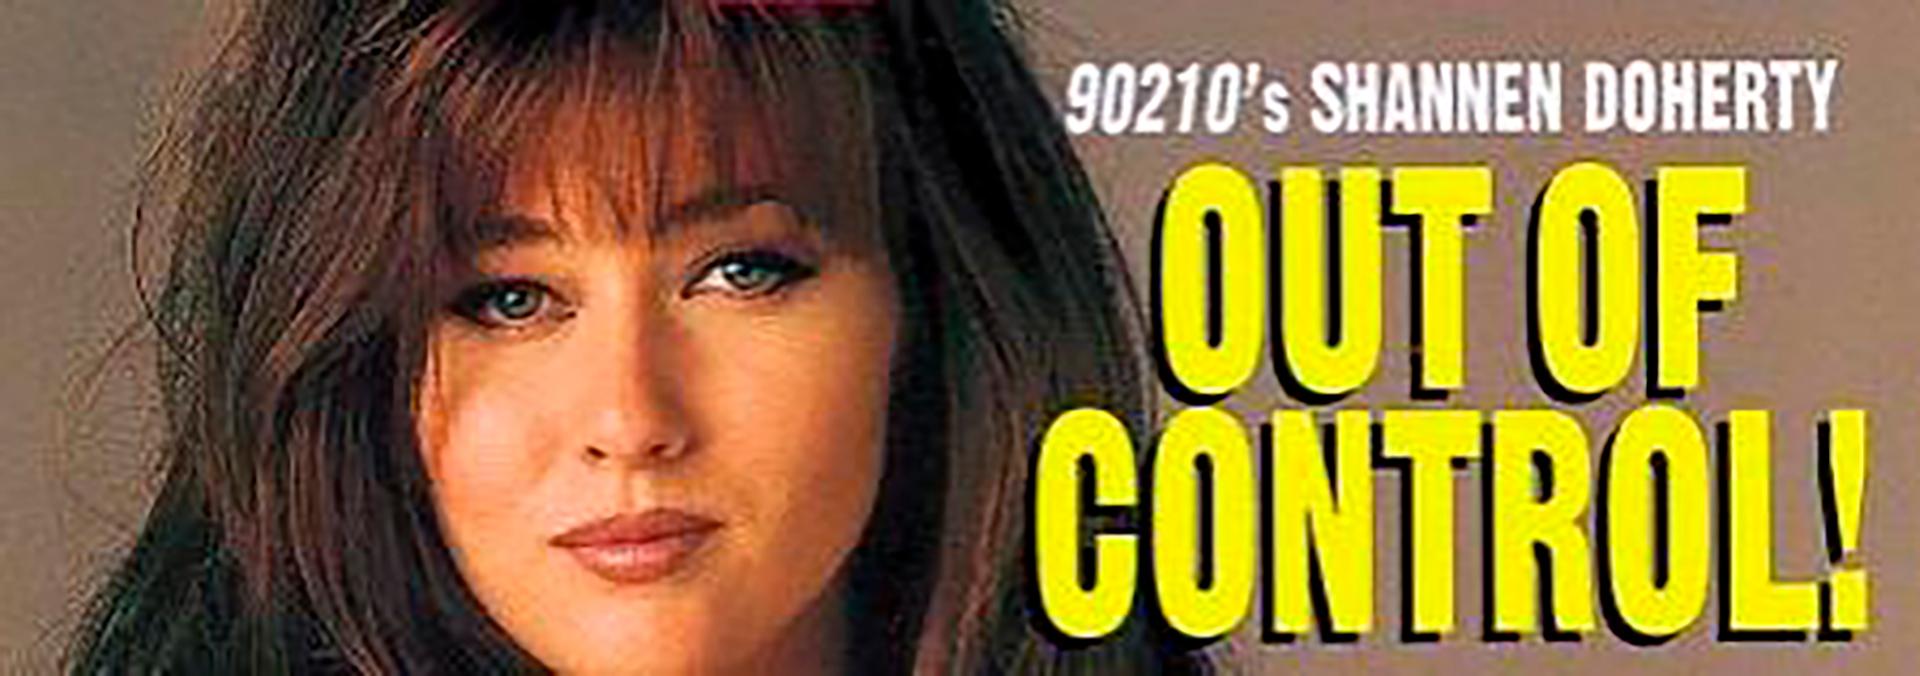 Shannen Doherty, la chica mala de los 90'